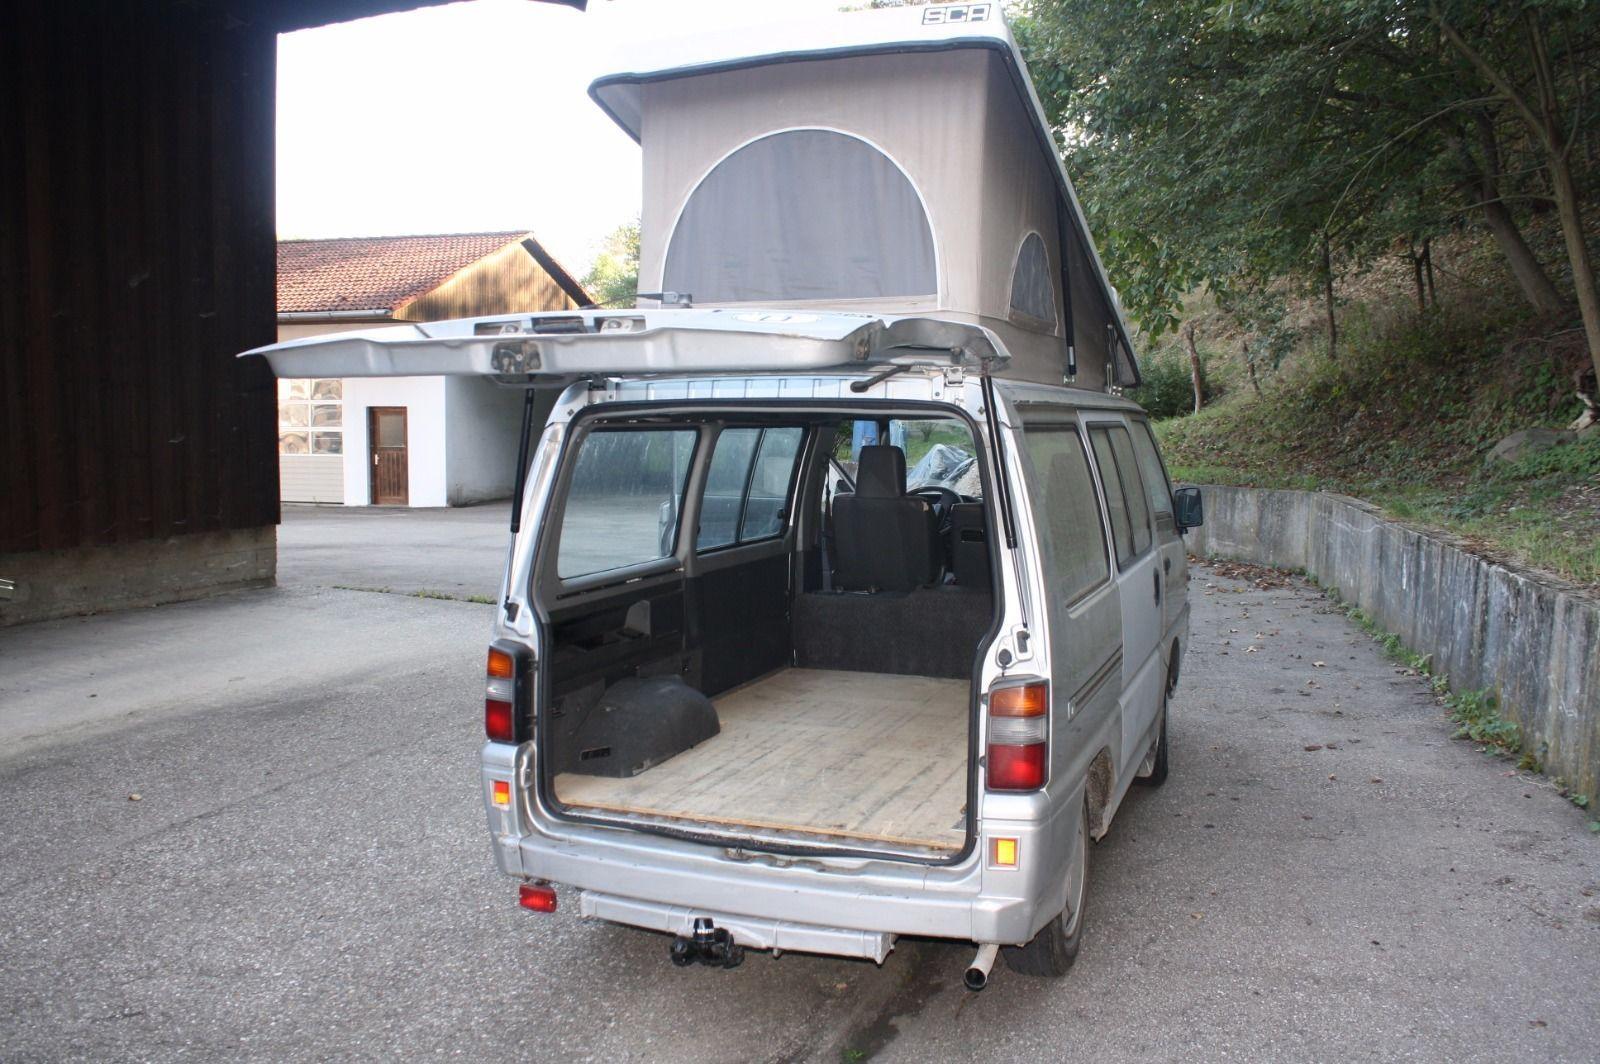 mitsubishi l300 wohnmobil ebay l300 wohnmobil. Black Bedroom Furniture Sets. Home Design Ideas